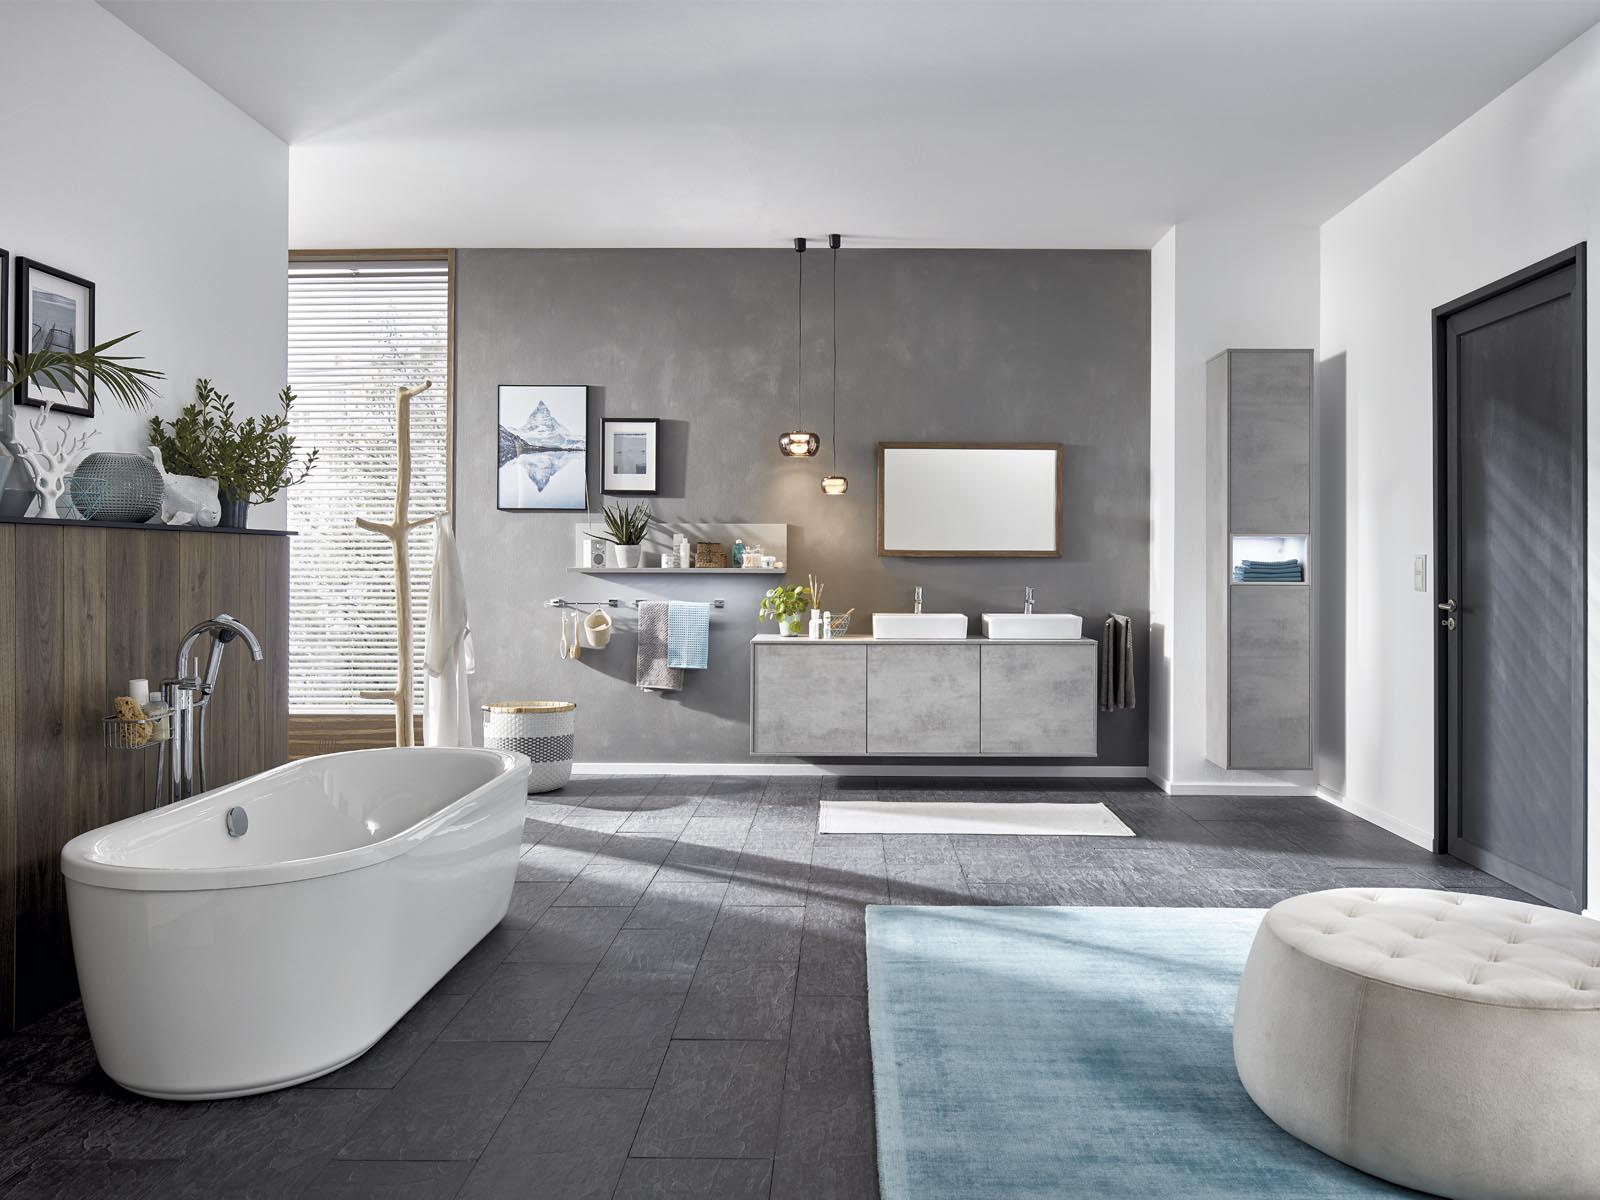 Küchentime Riva 892 - Bathroom